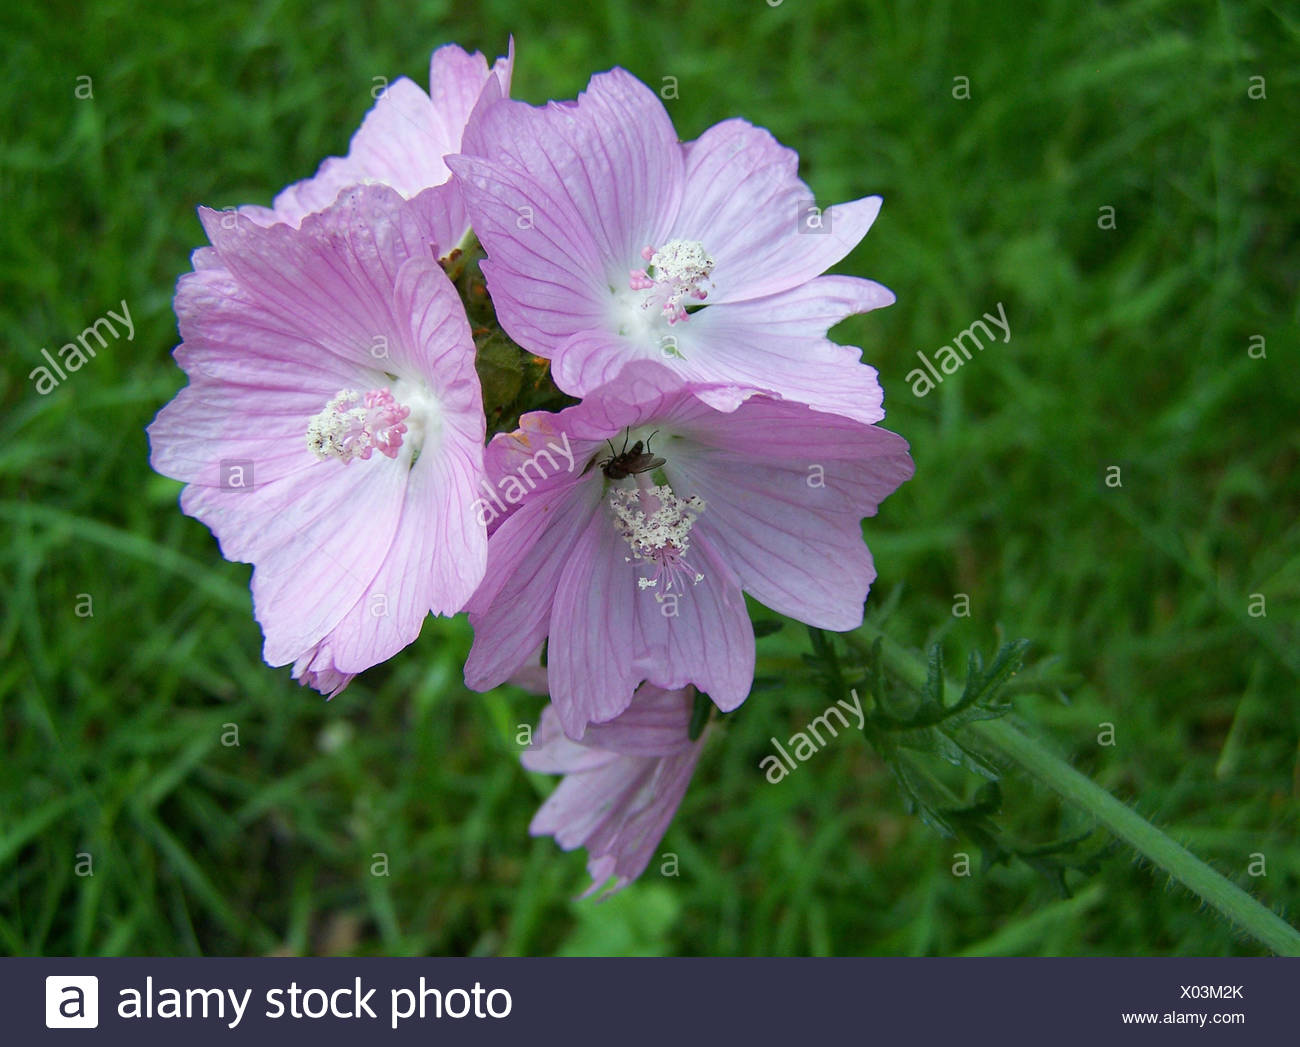 insect flower plant bloom blossom flourish flourishing flora botany fly meadow Stock Photo